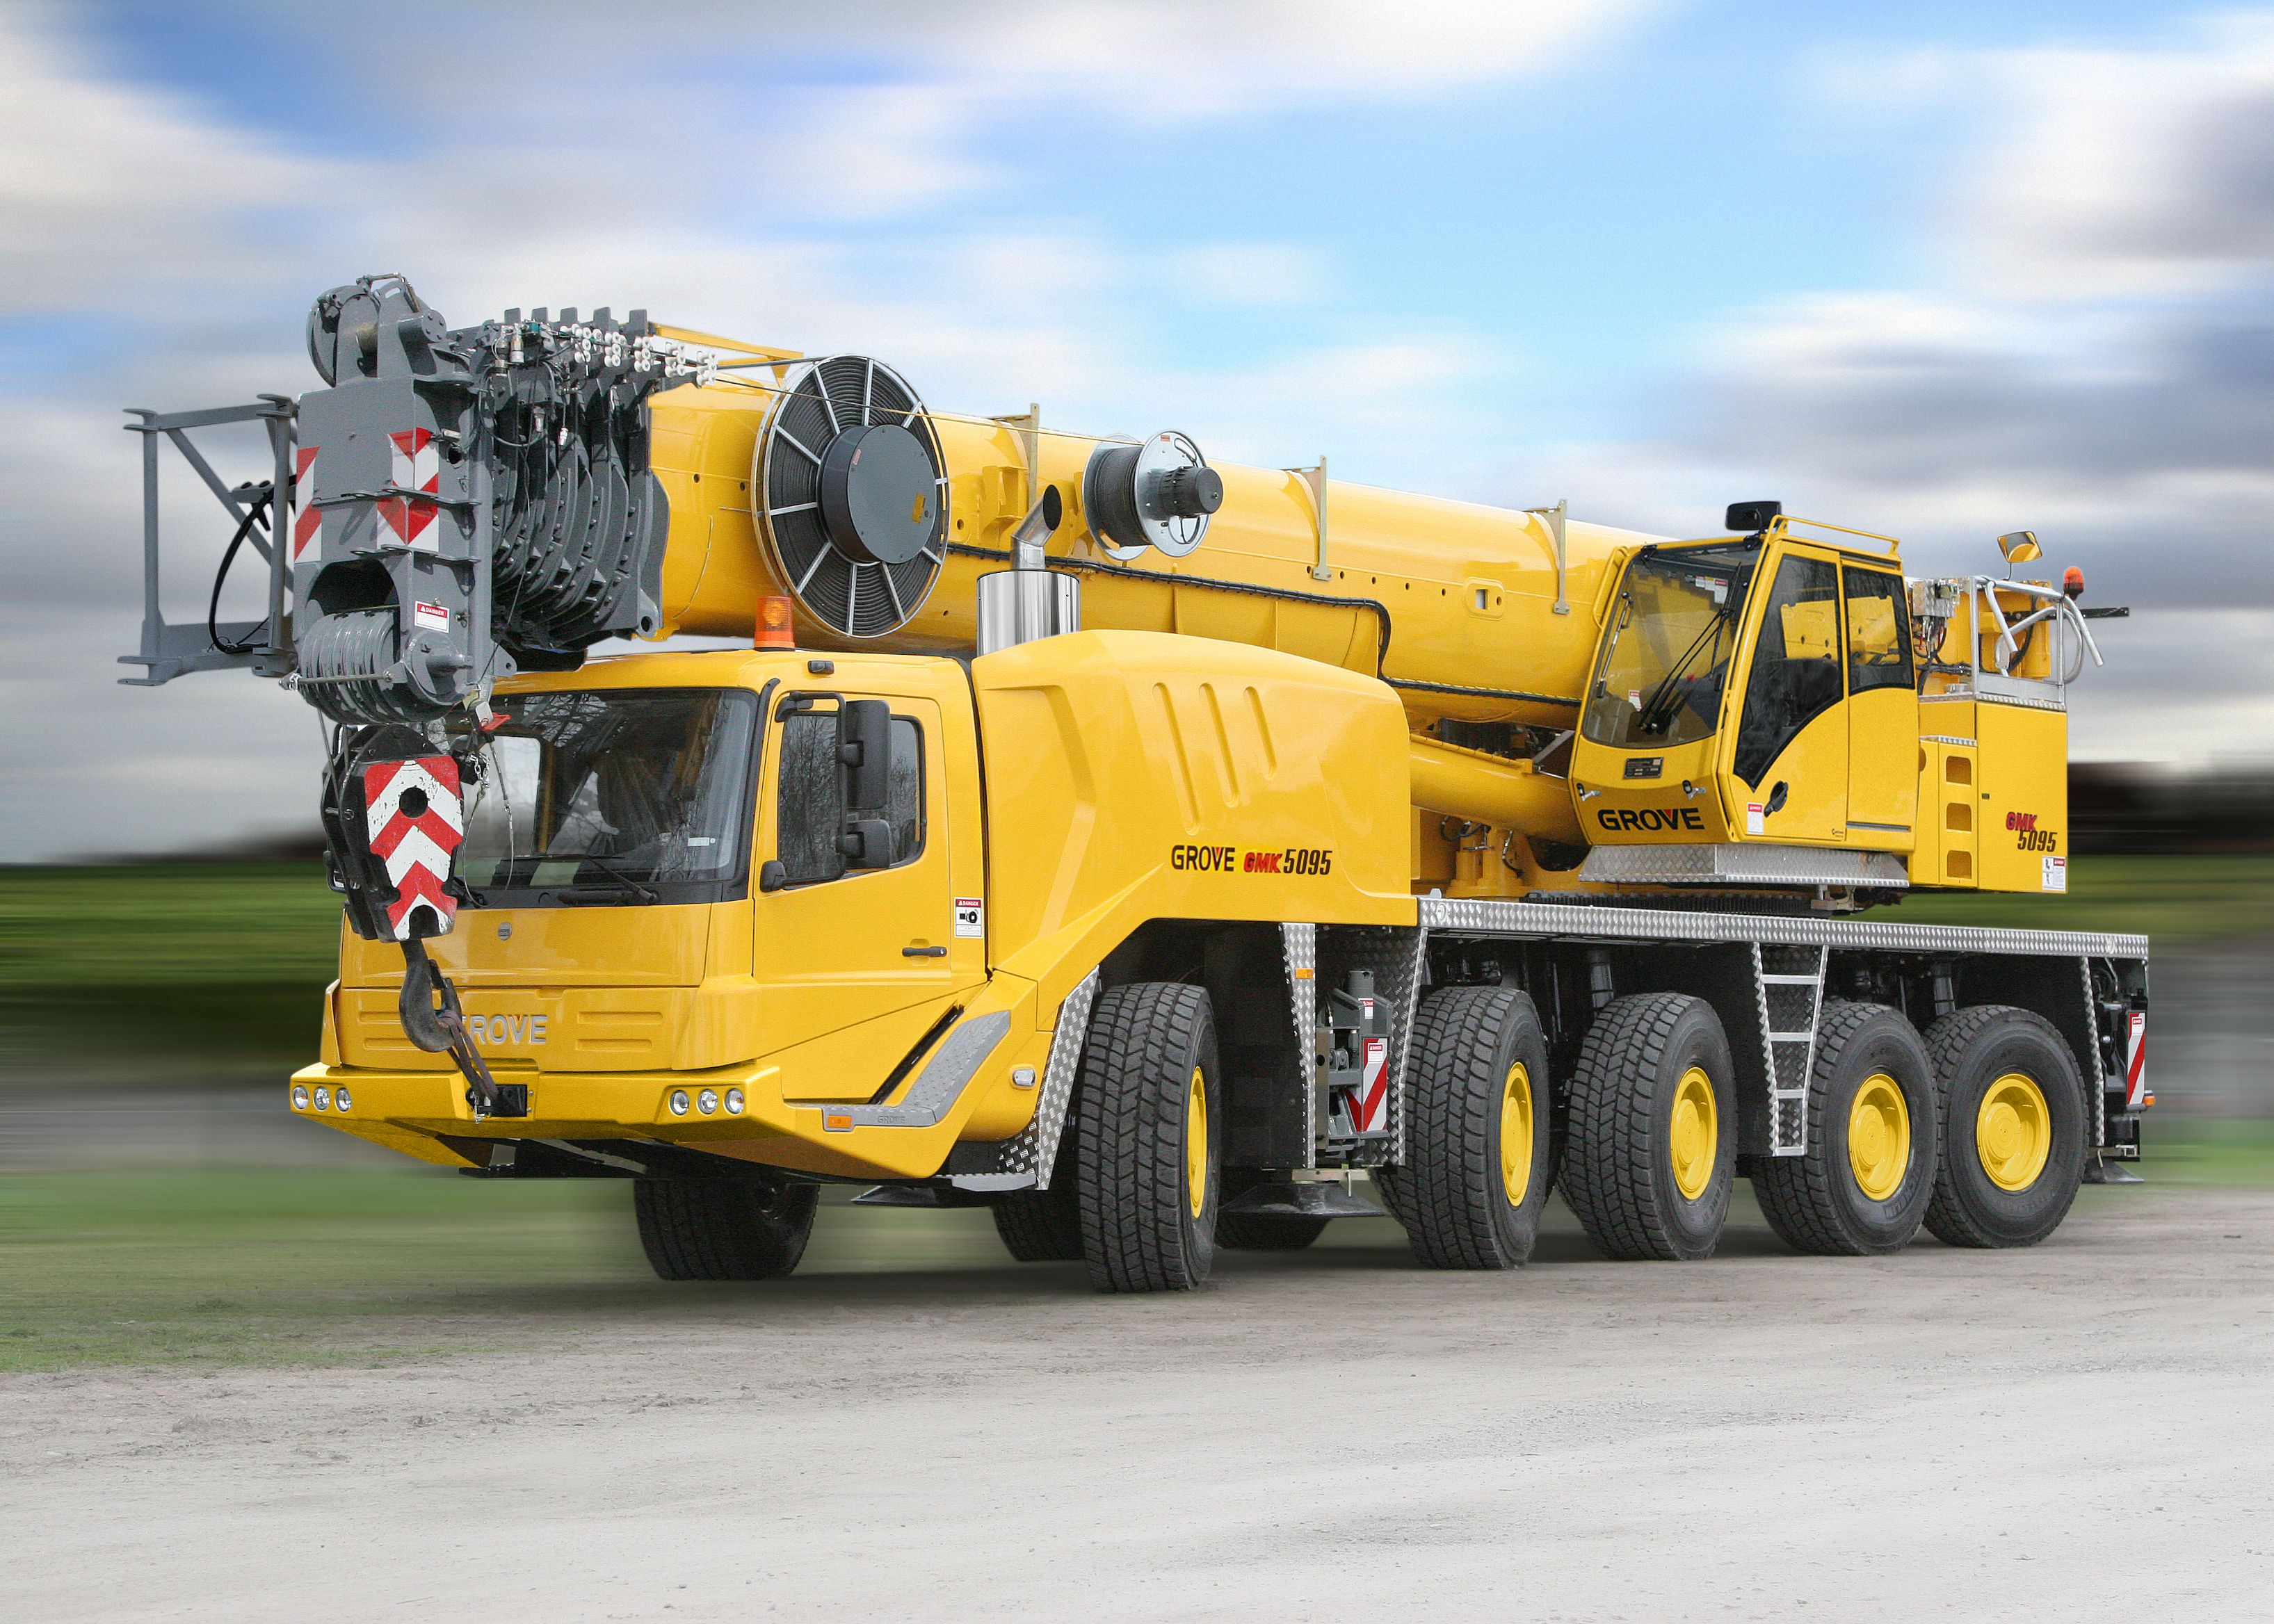 Grove 5095 All Terrain Mobile Crane | Twin Steer | Crane